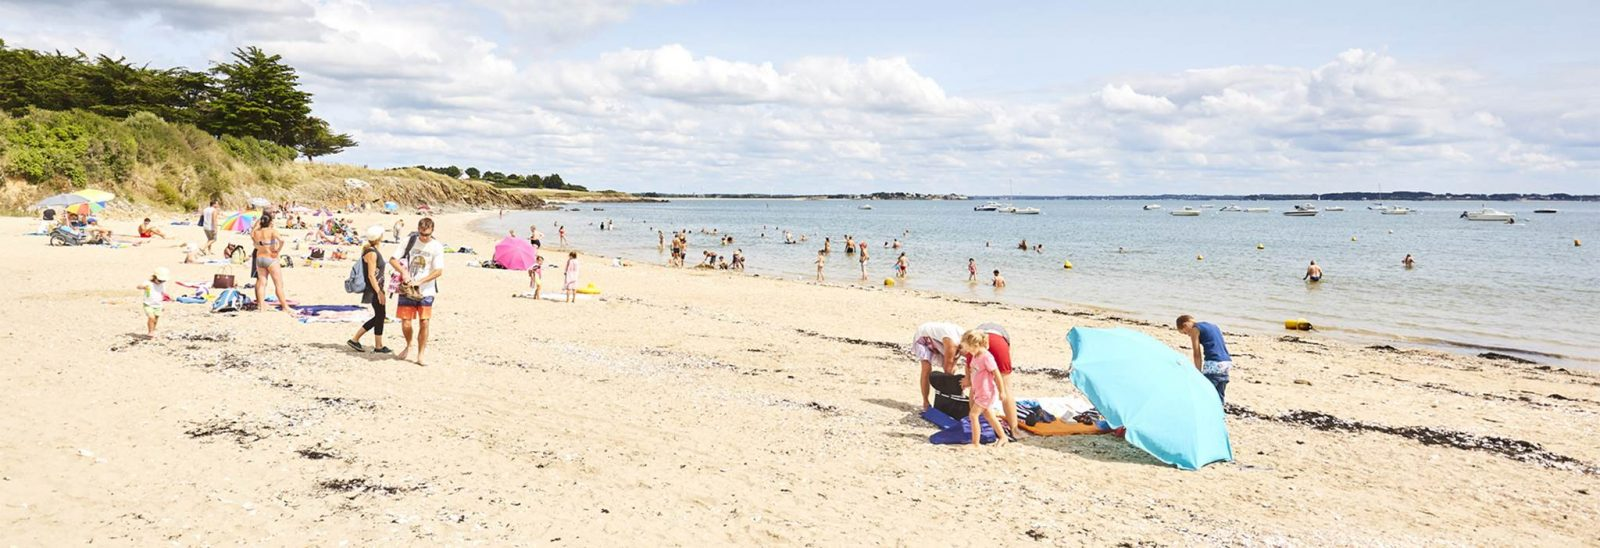 Plage de Cromenach Ambon Morbihan